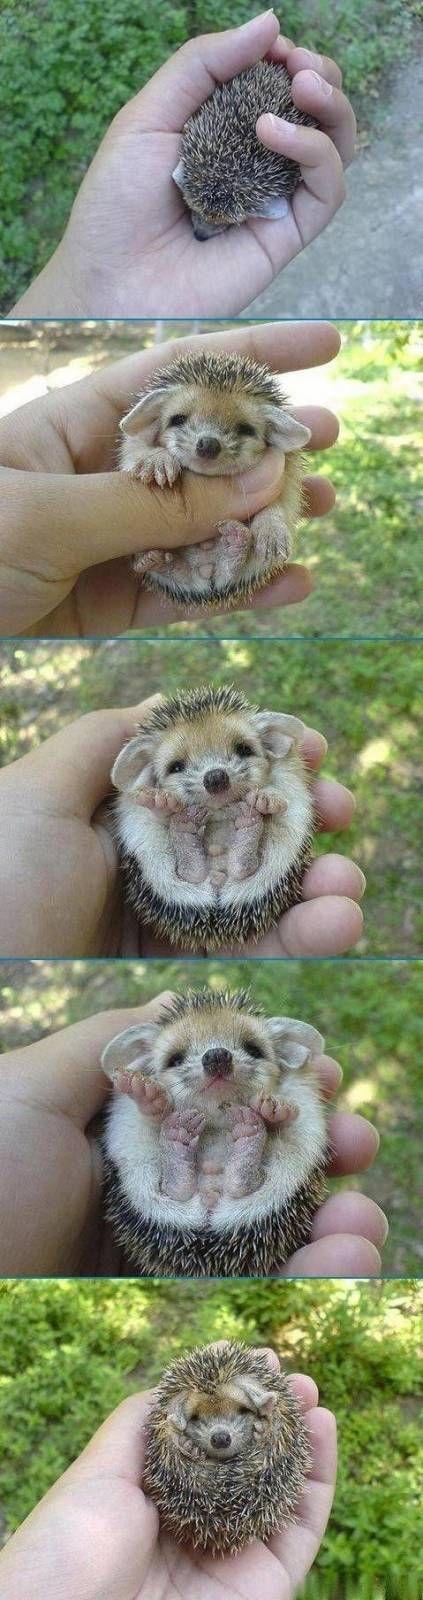 I want a hedgehog so bad!